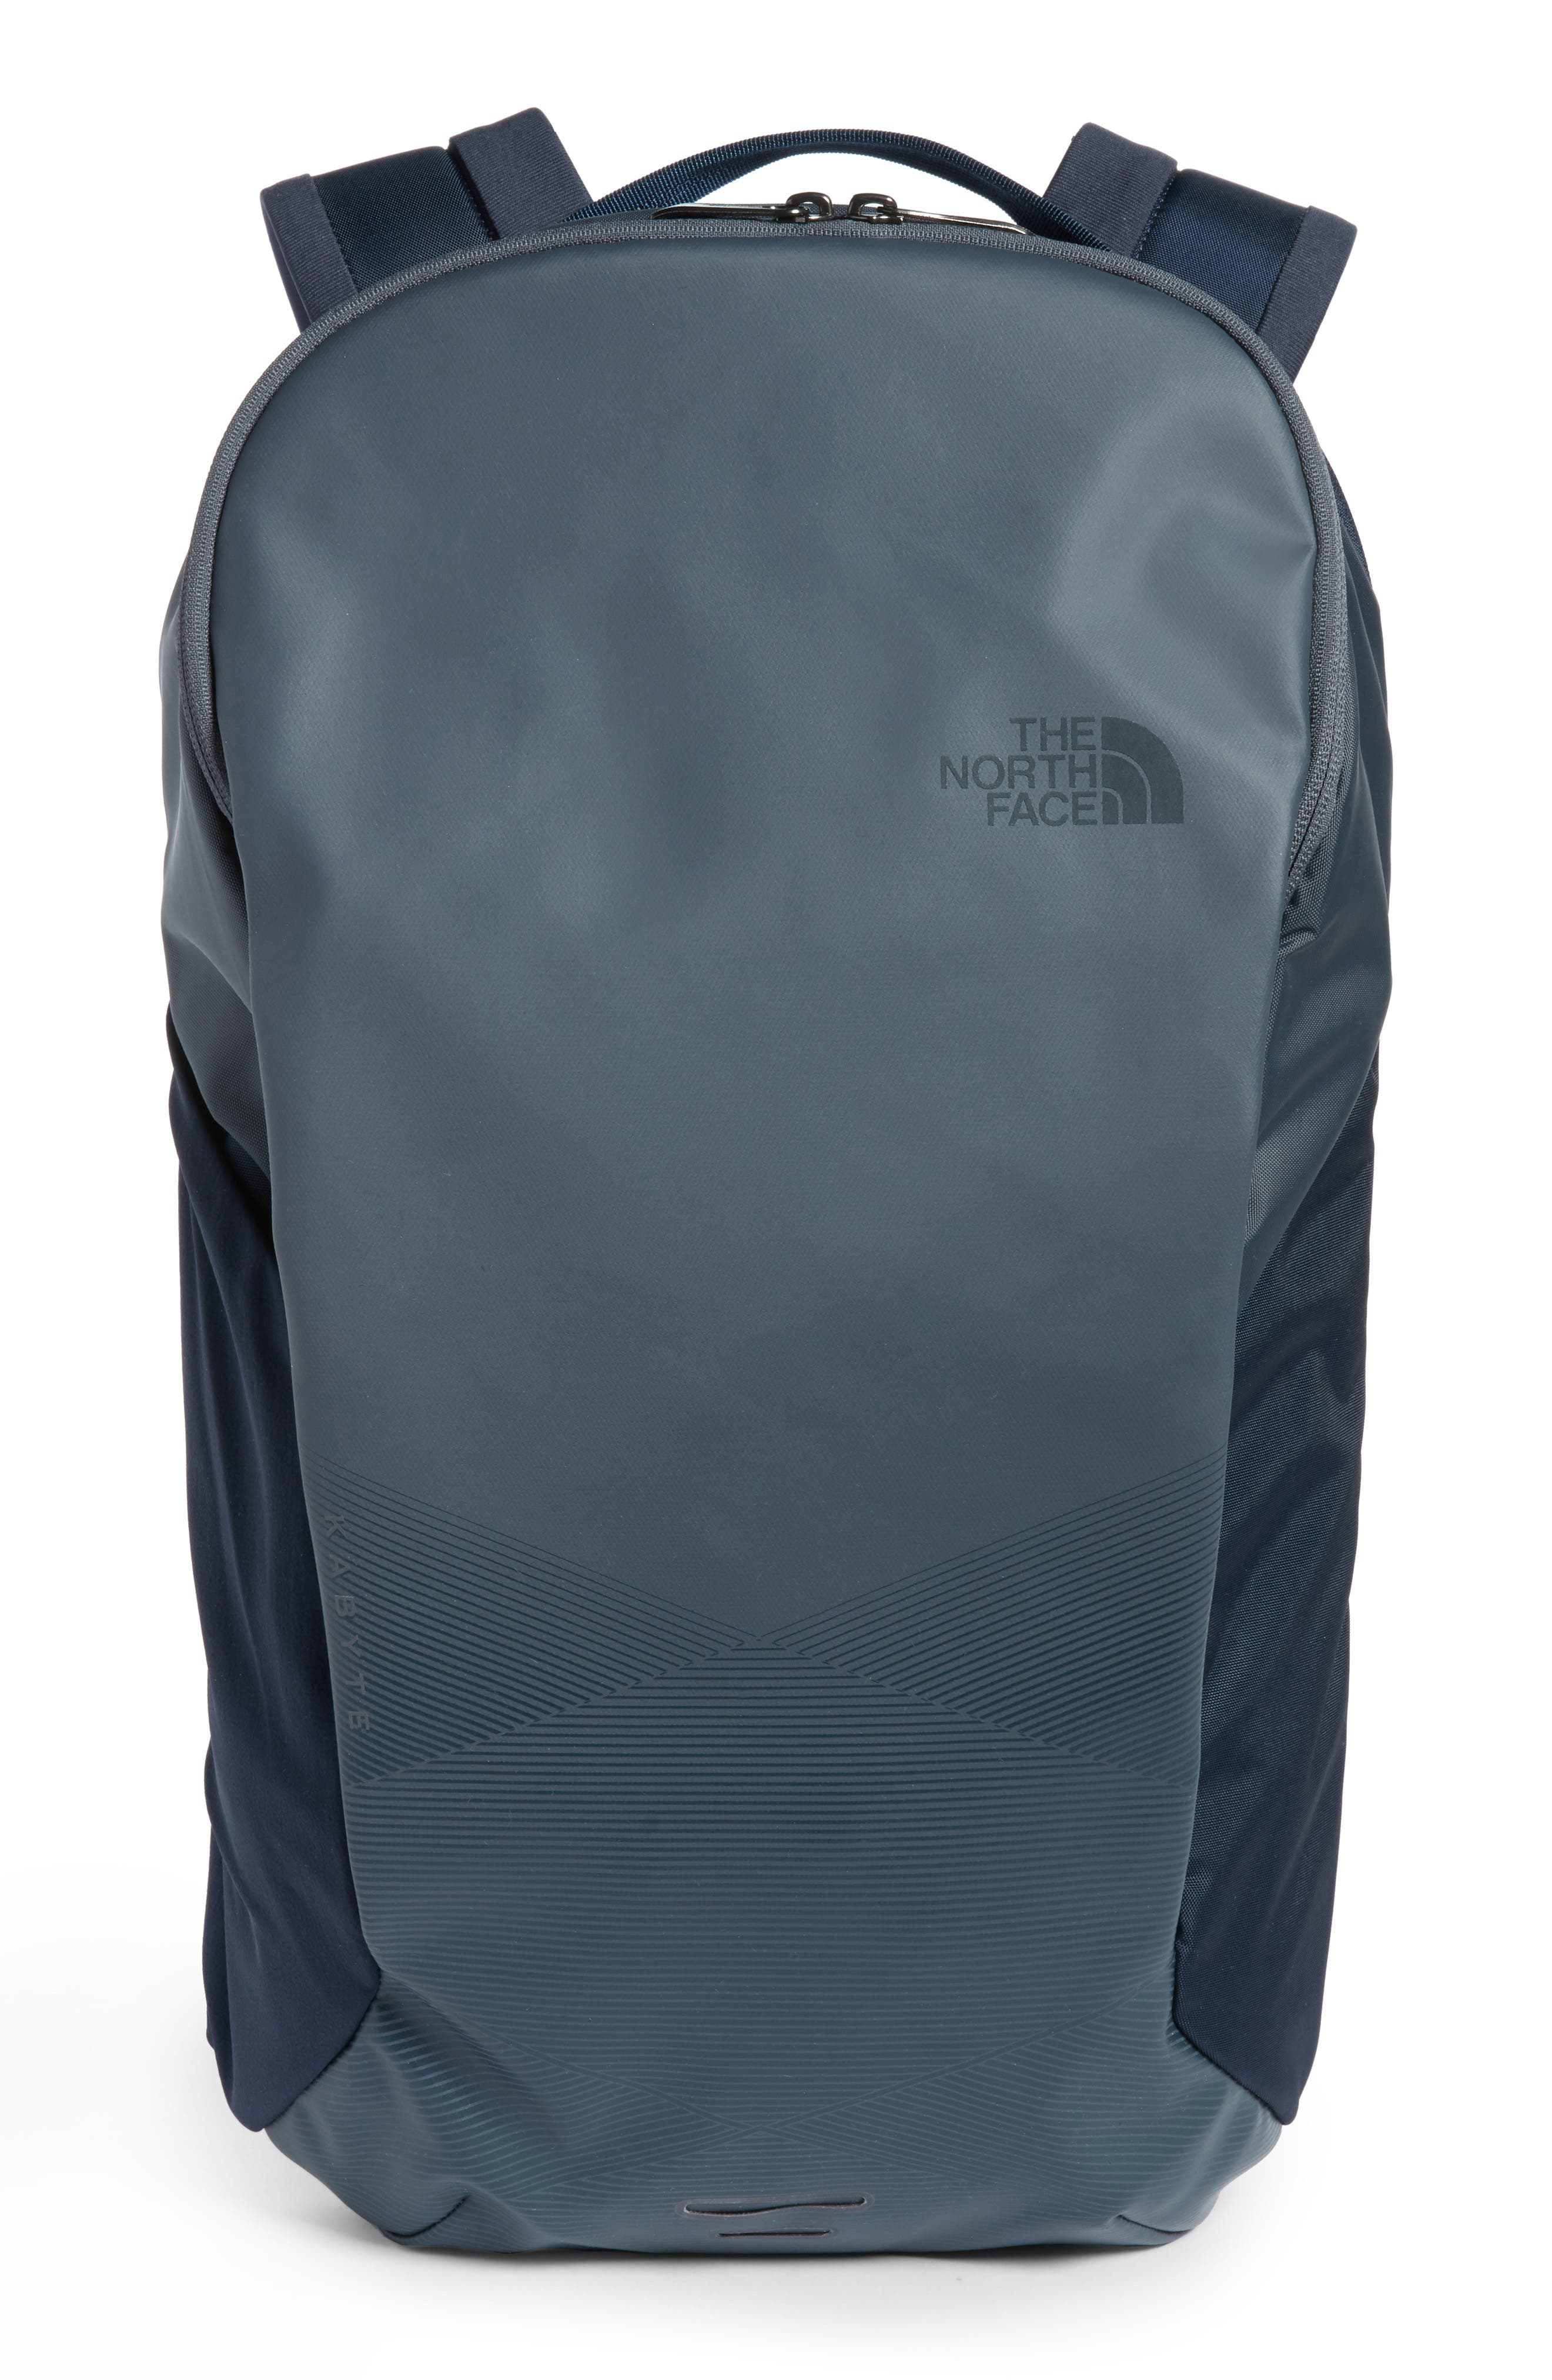 Kabyte Backpack,                         Main,                         color, VANADIS GREY/ URBAN NAVY